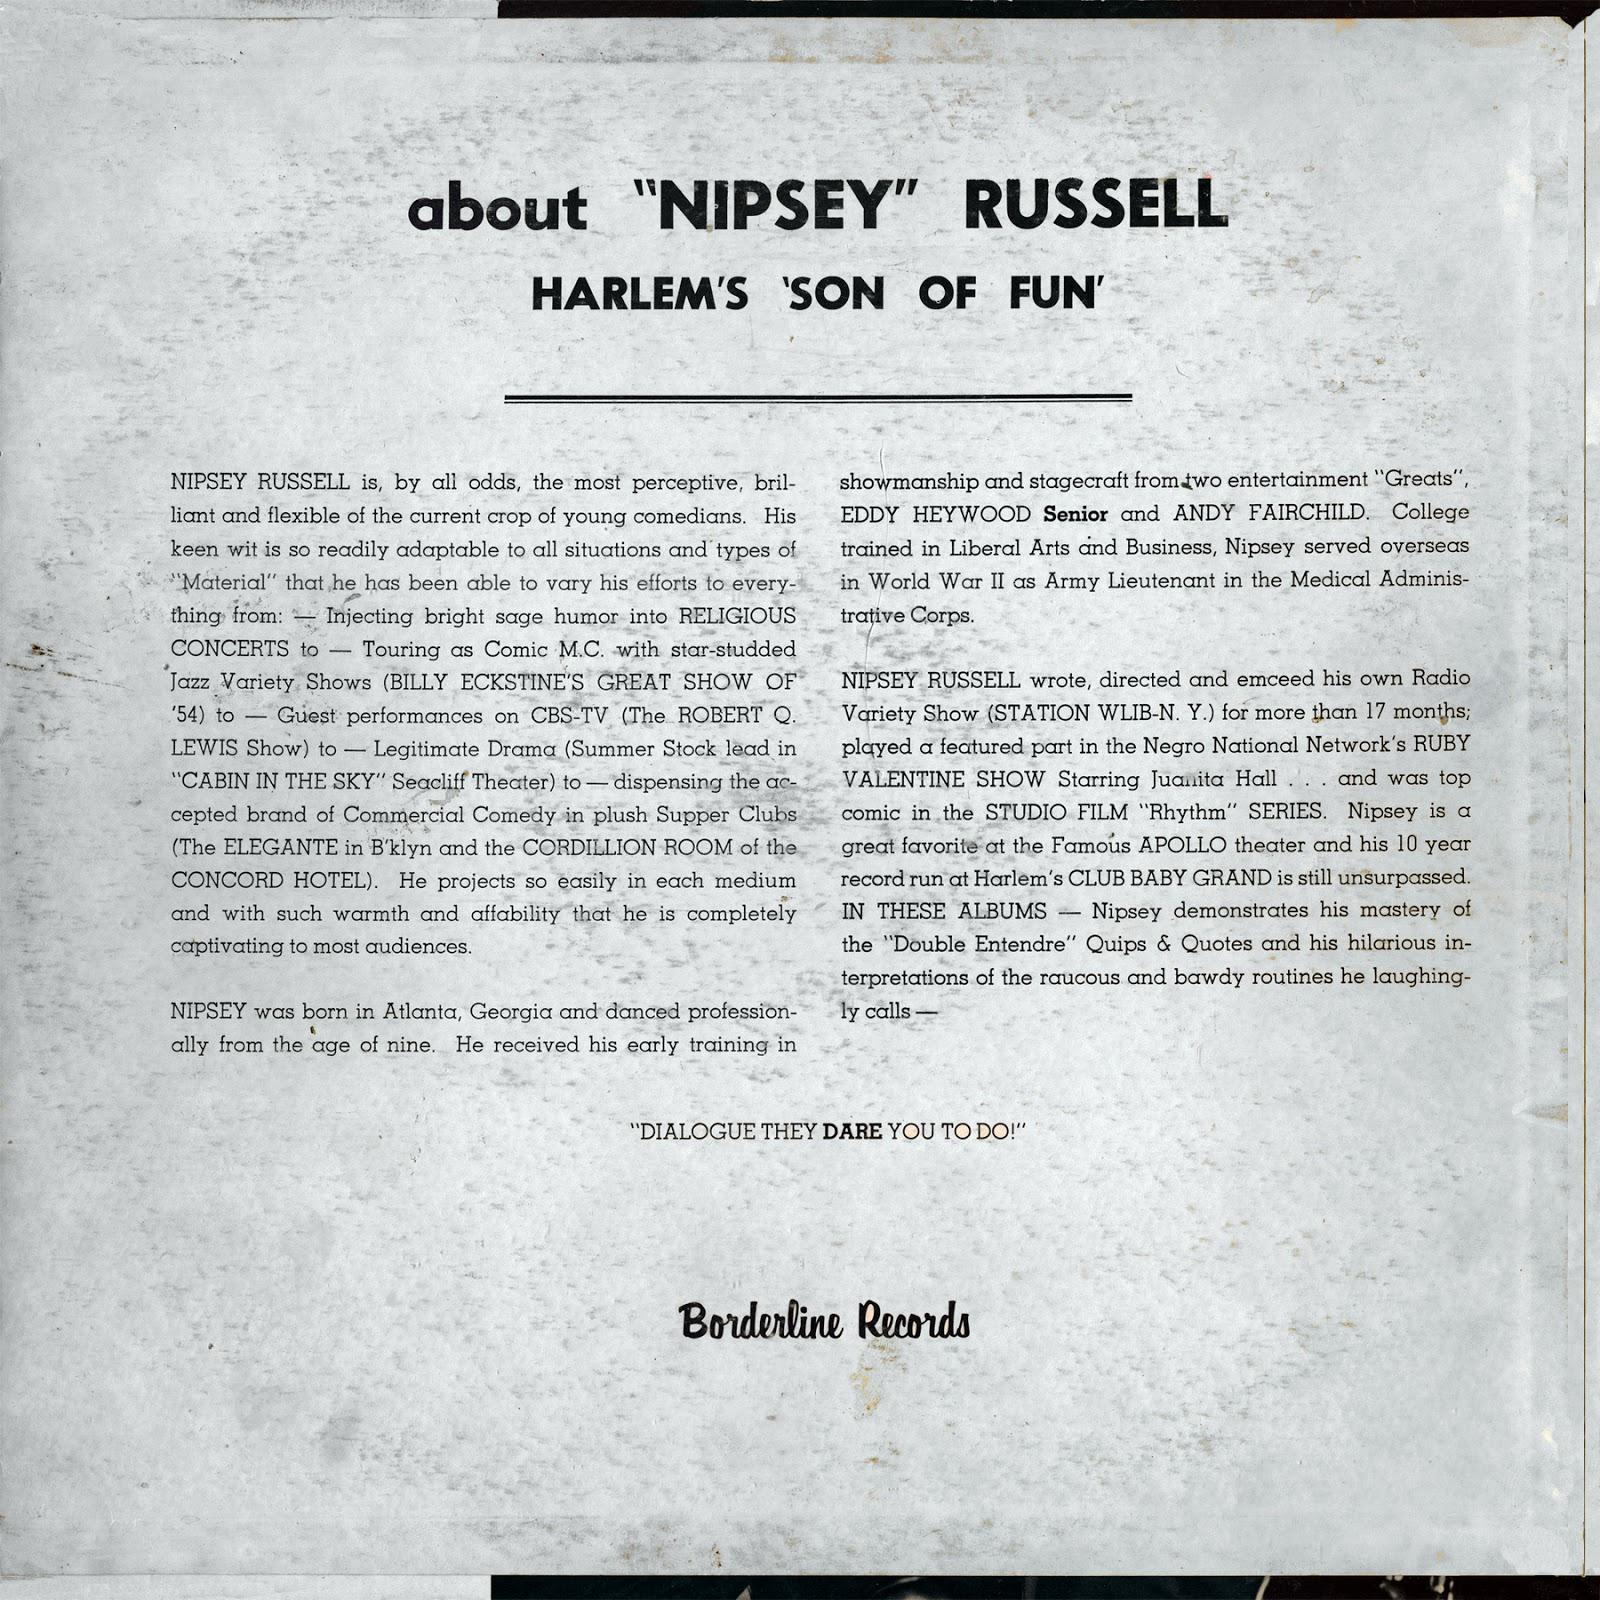 Nipsey Russell - Harlem's